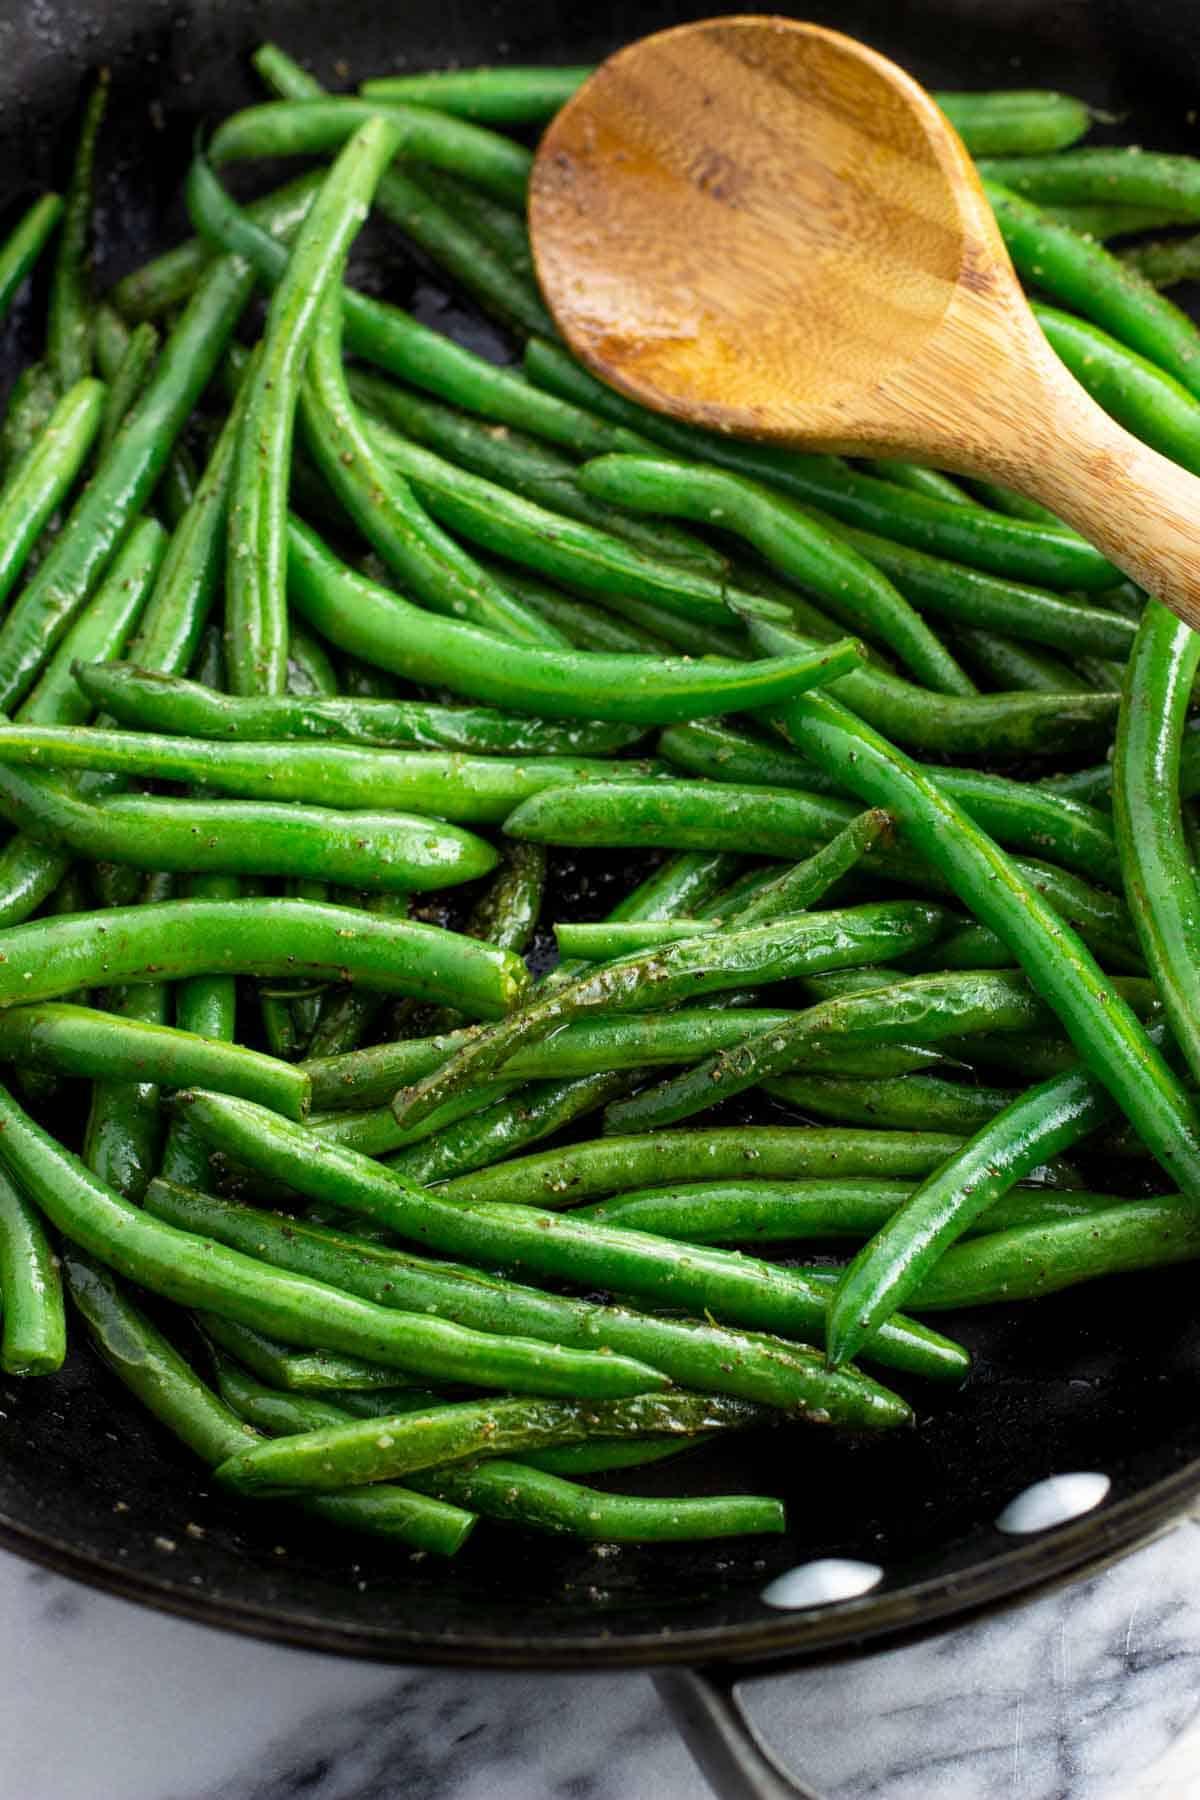 Green beans in a pan with a spoon halfway through sautéing.